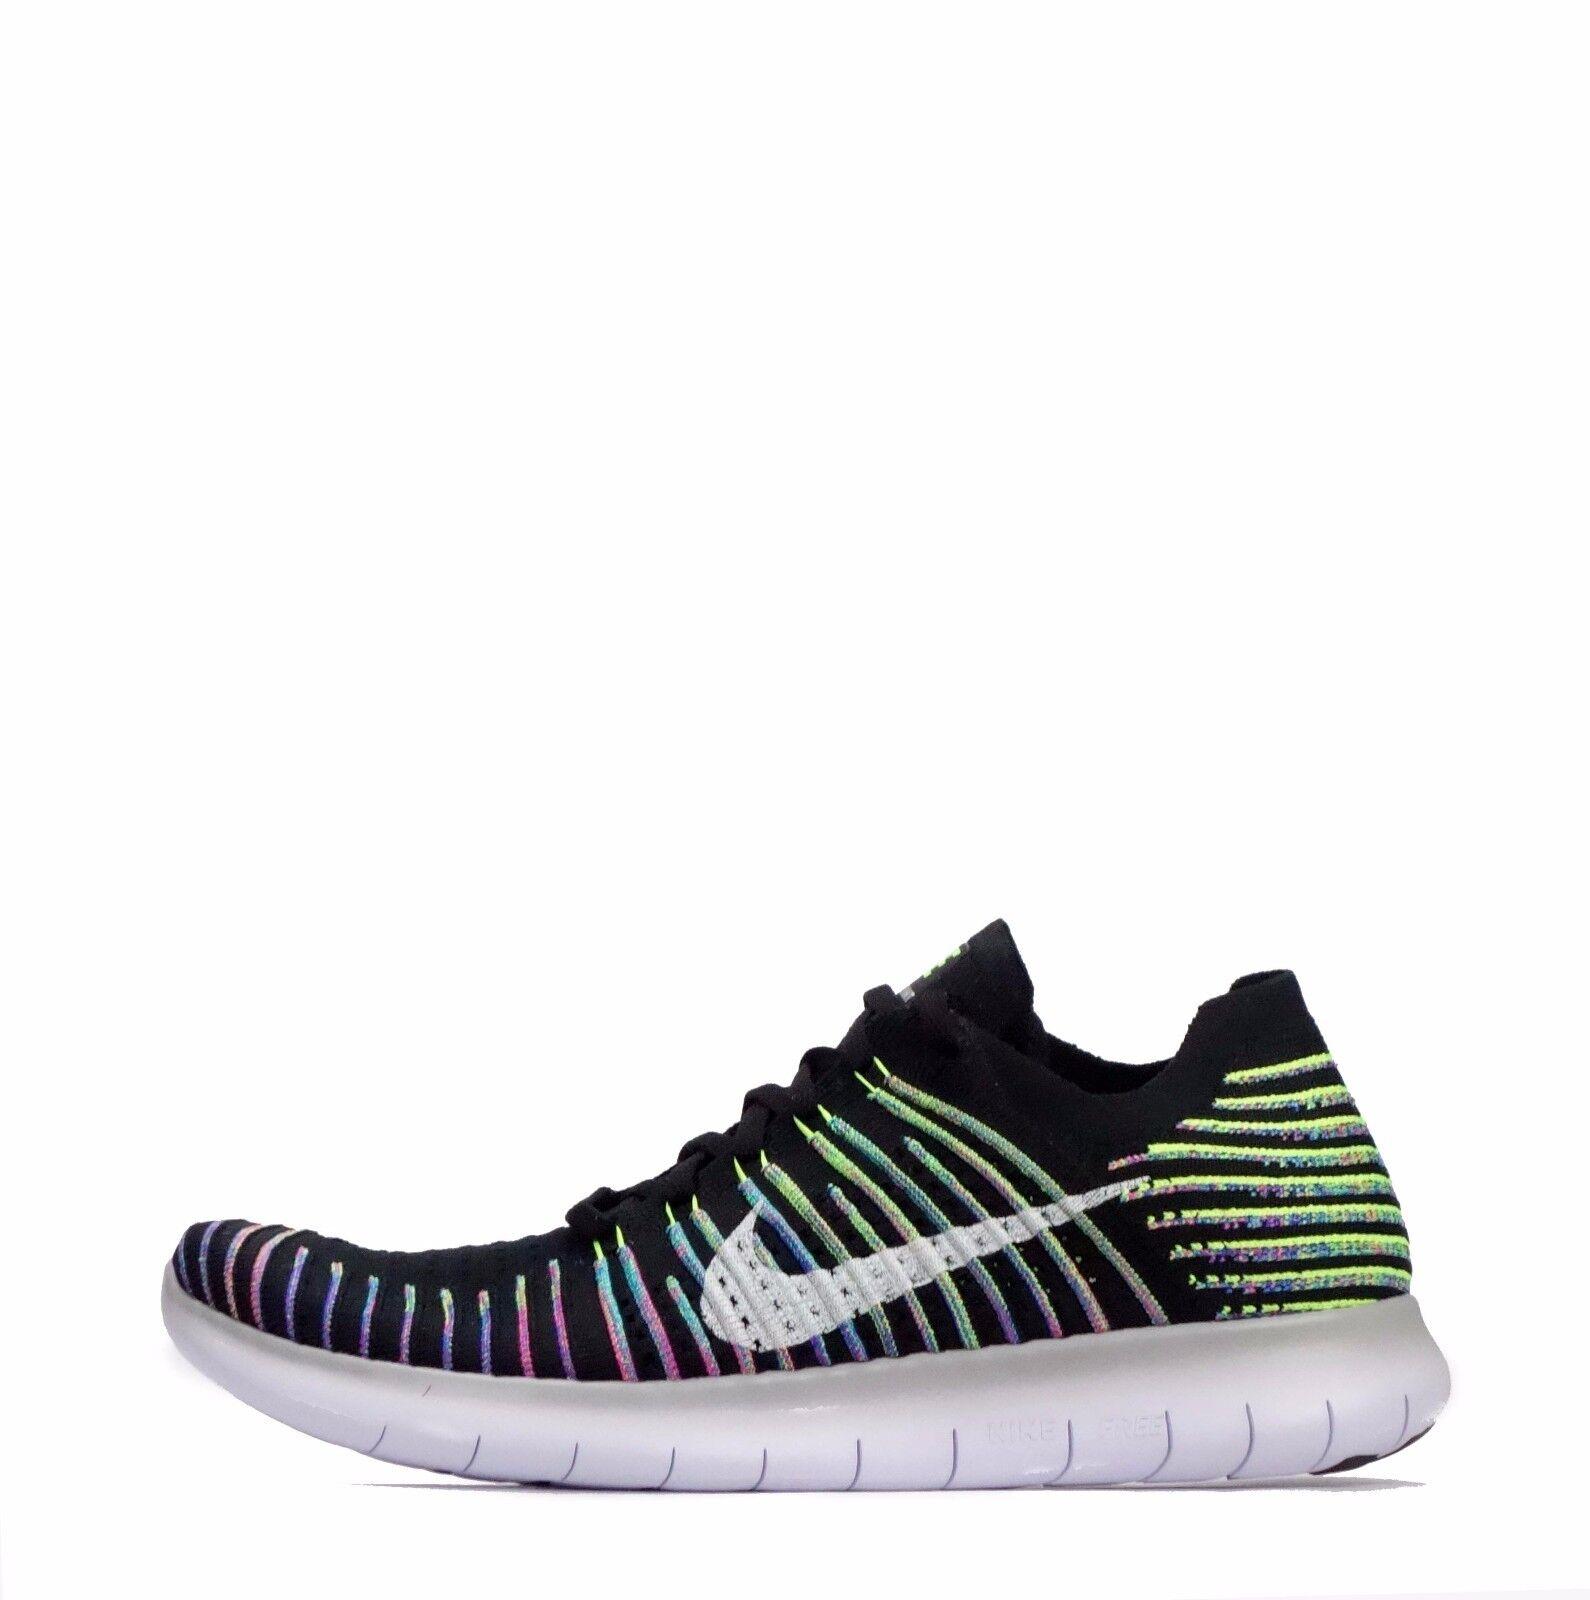 Nike Gratis Rn Run Flyknit Herren Laufschuhe Black/Volt